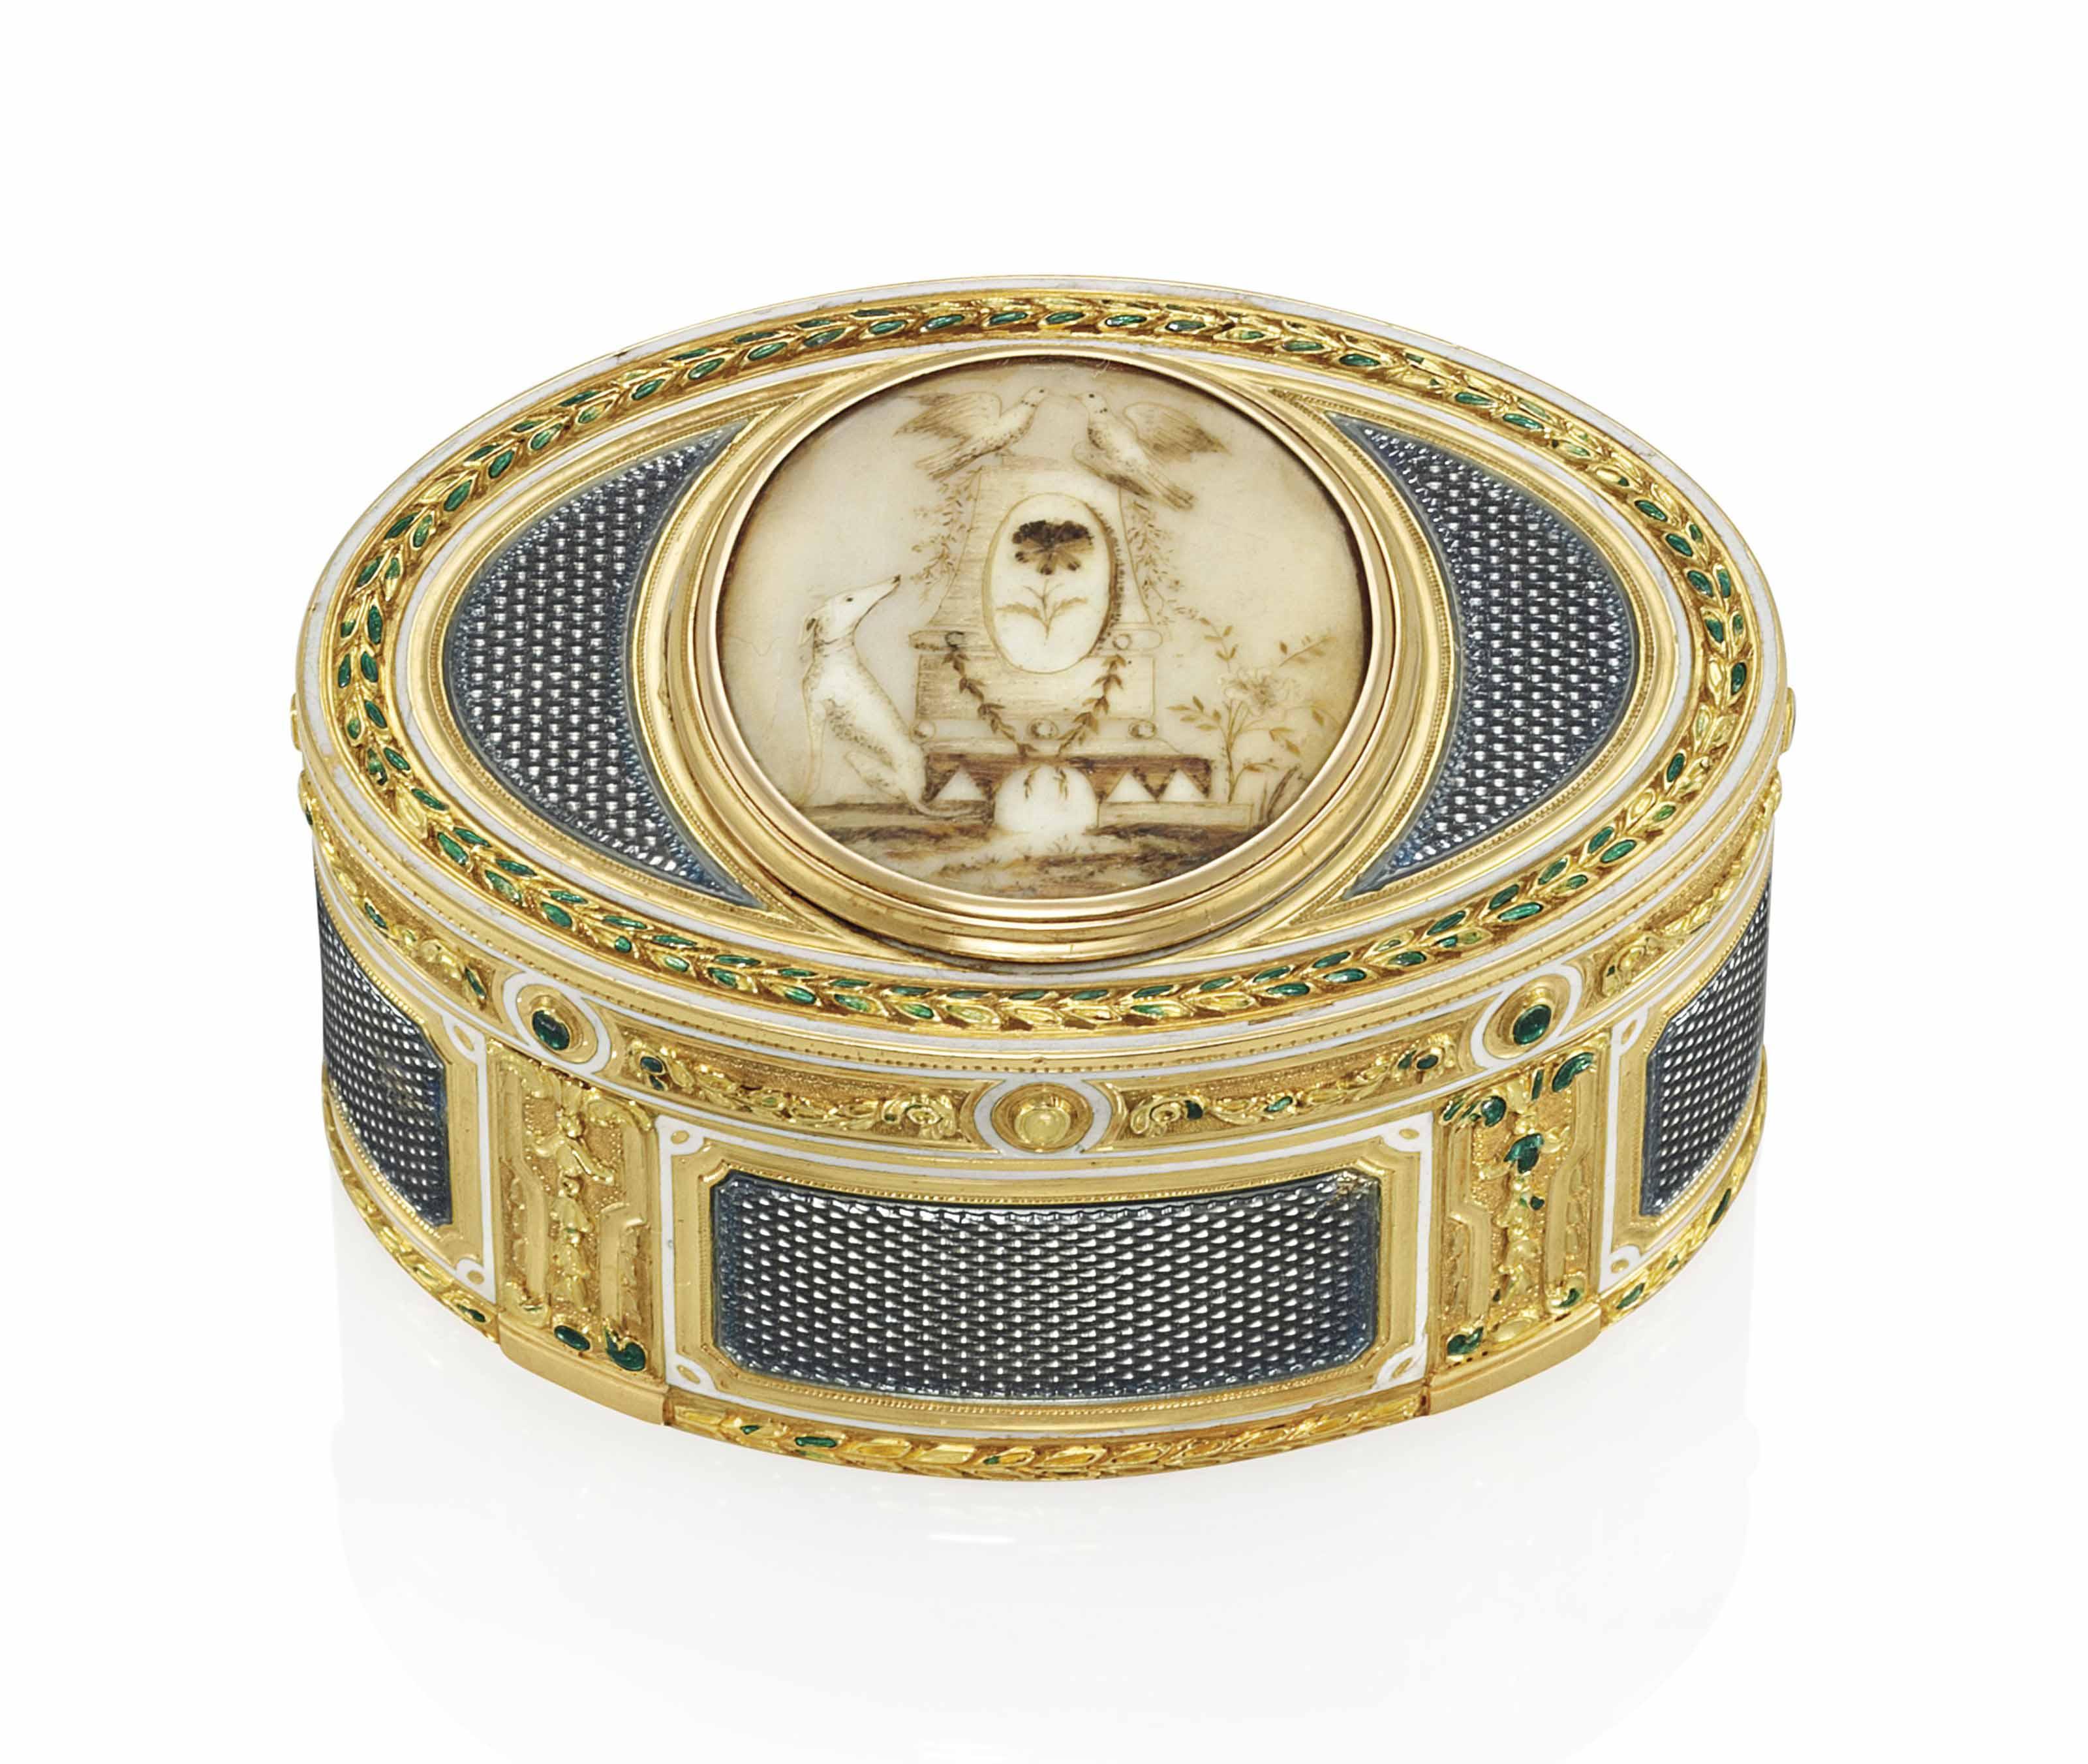 A LOUIS XV ENAMELLED GOLD SNUFF-BOX